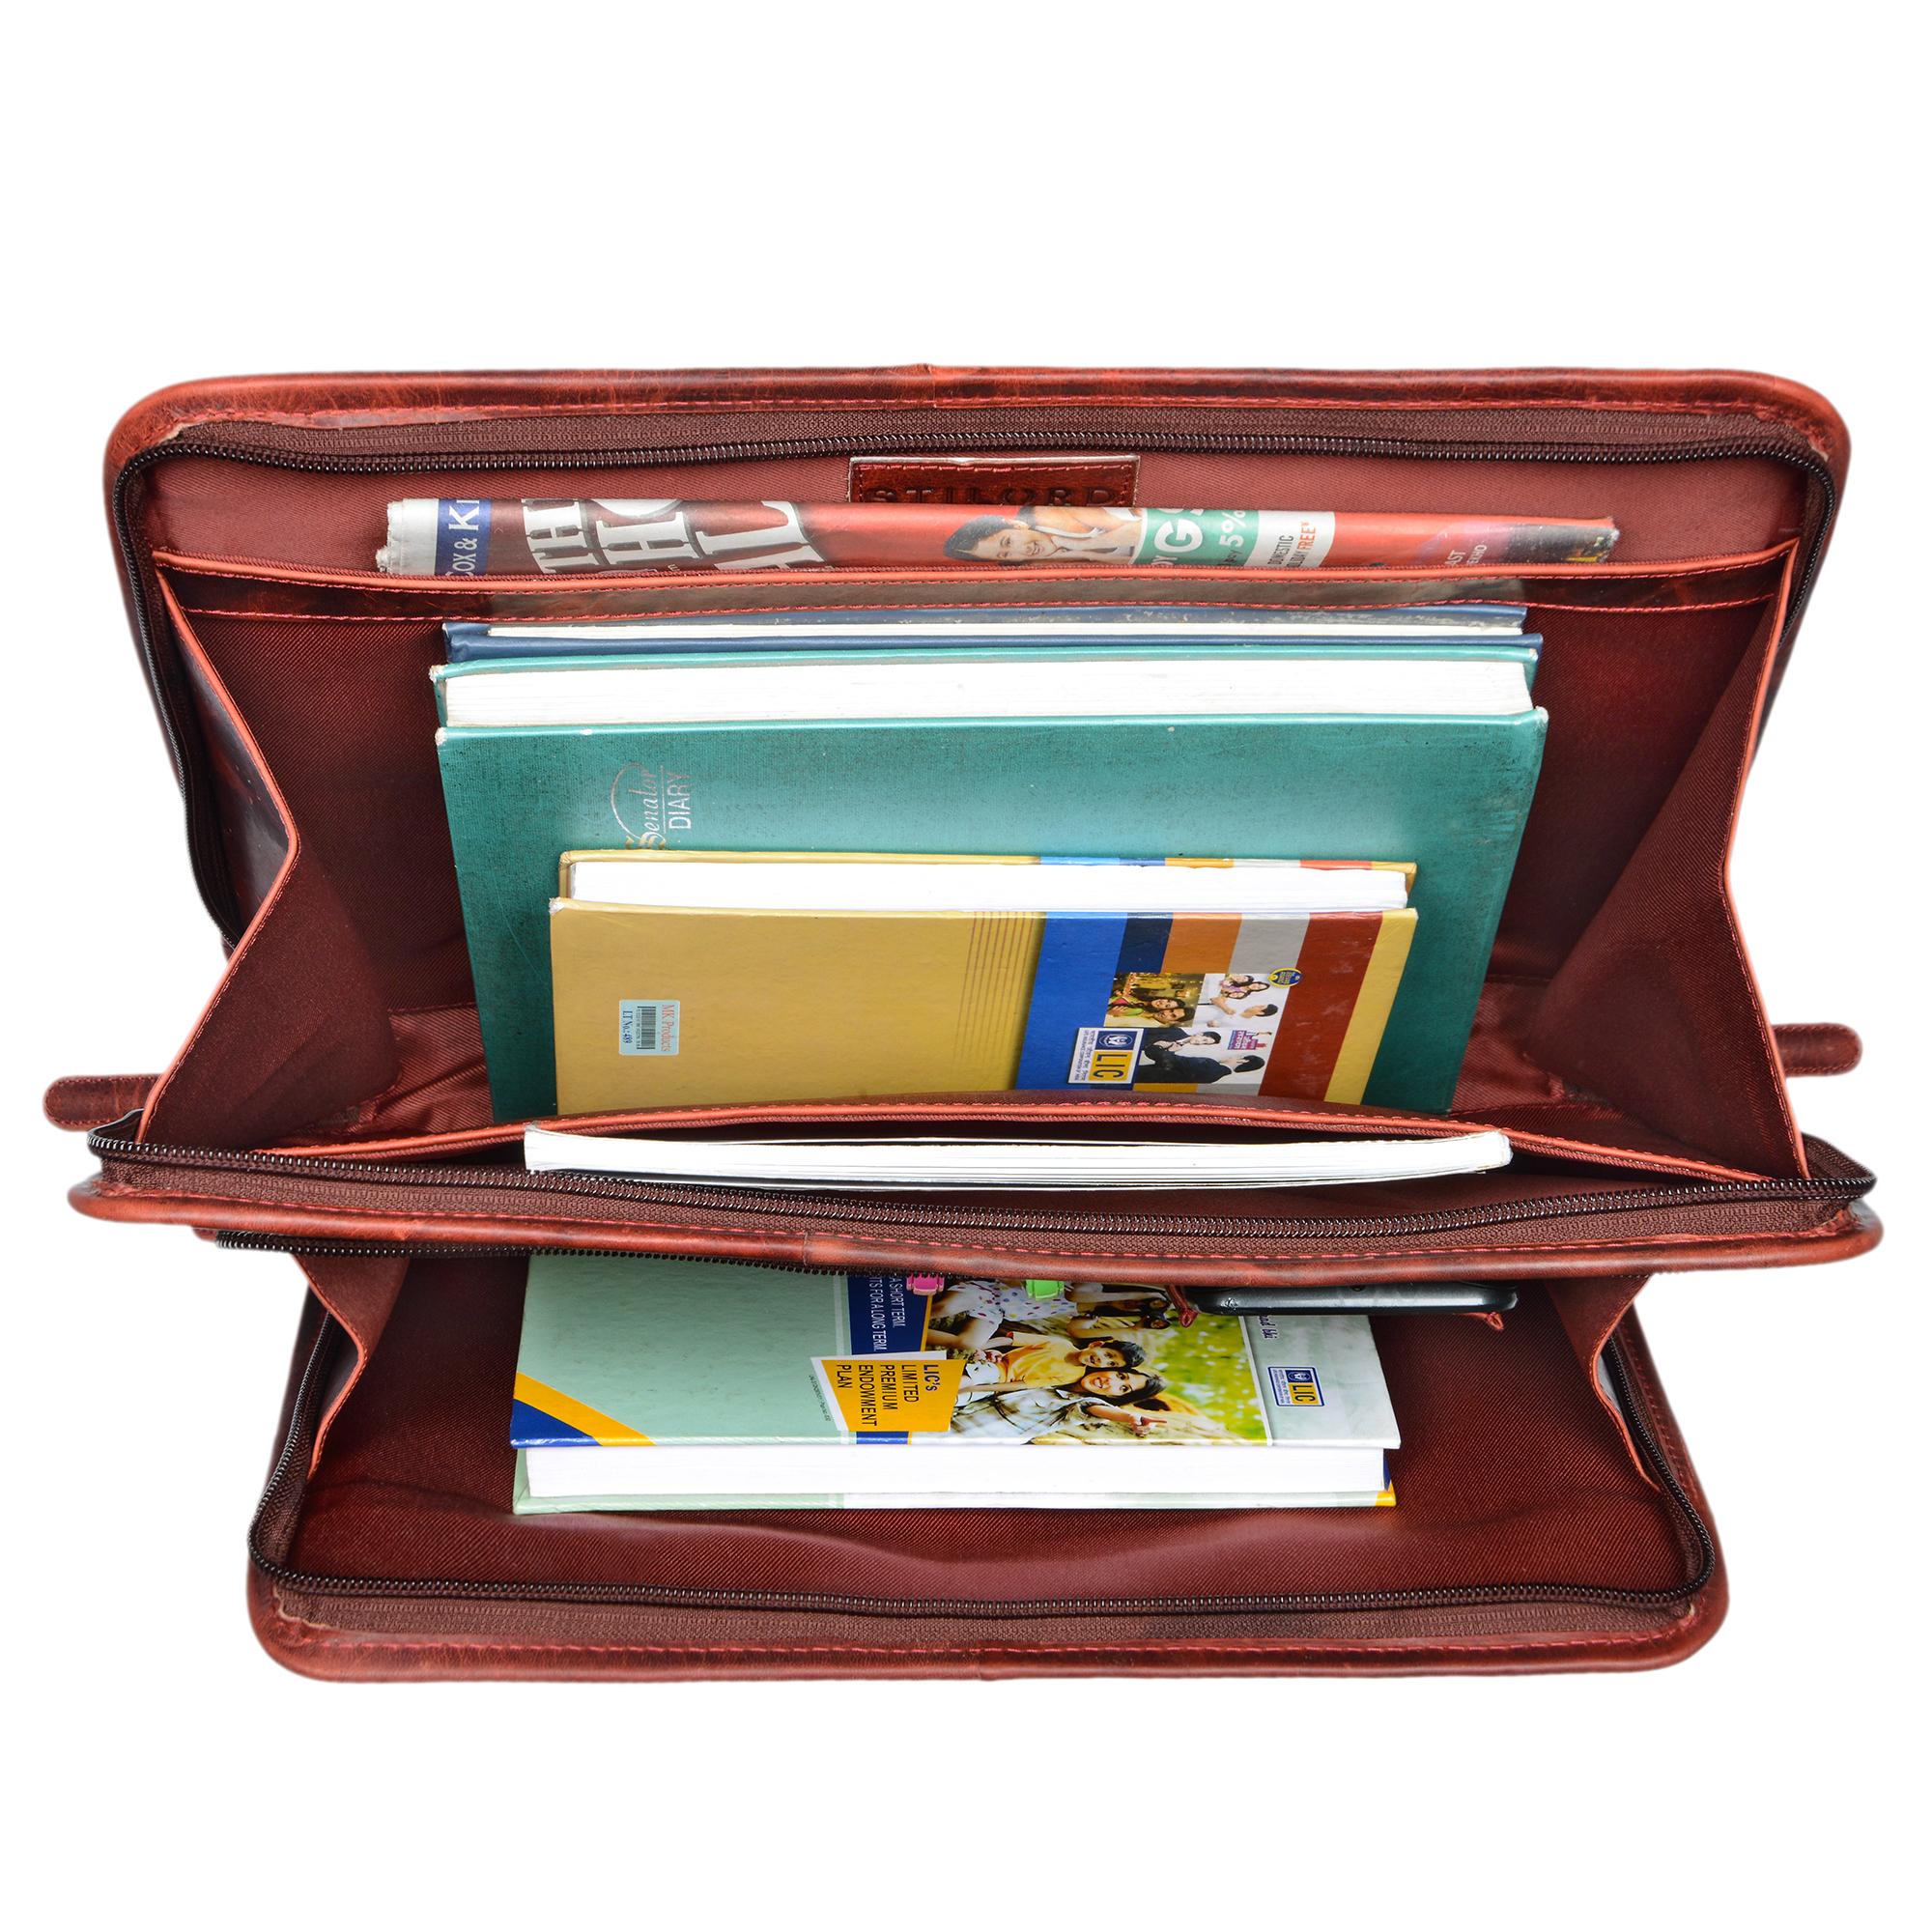 "STILORD ""Maximilian"" Dokumentenmappe Leder 13,3 Zoll Vintage Schreibmappe MacBook Aktentasche Aktenmappe - Bild 25"